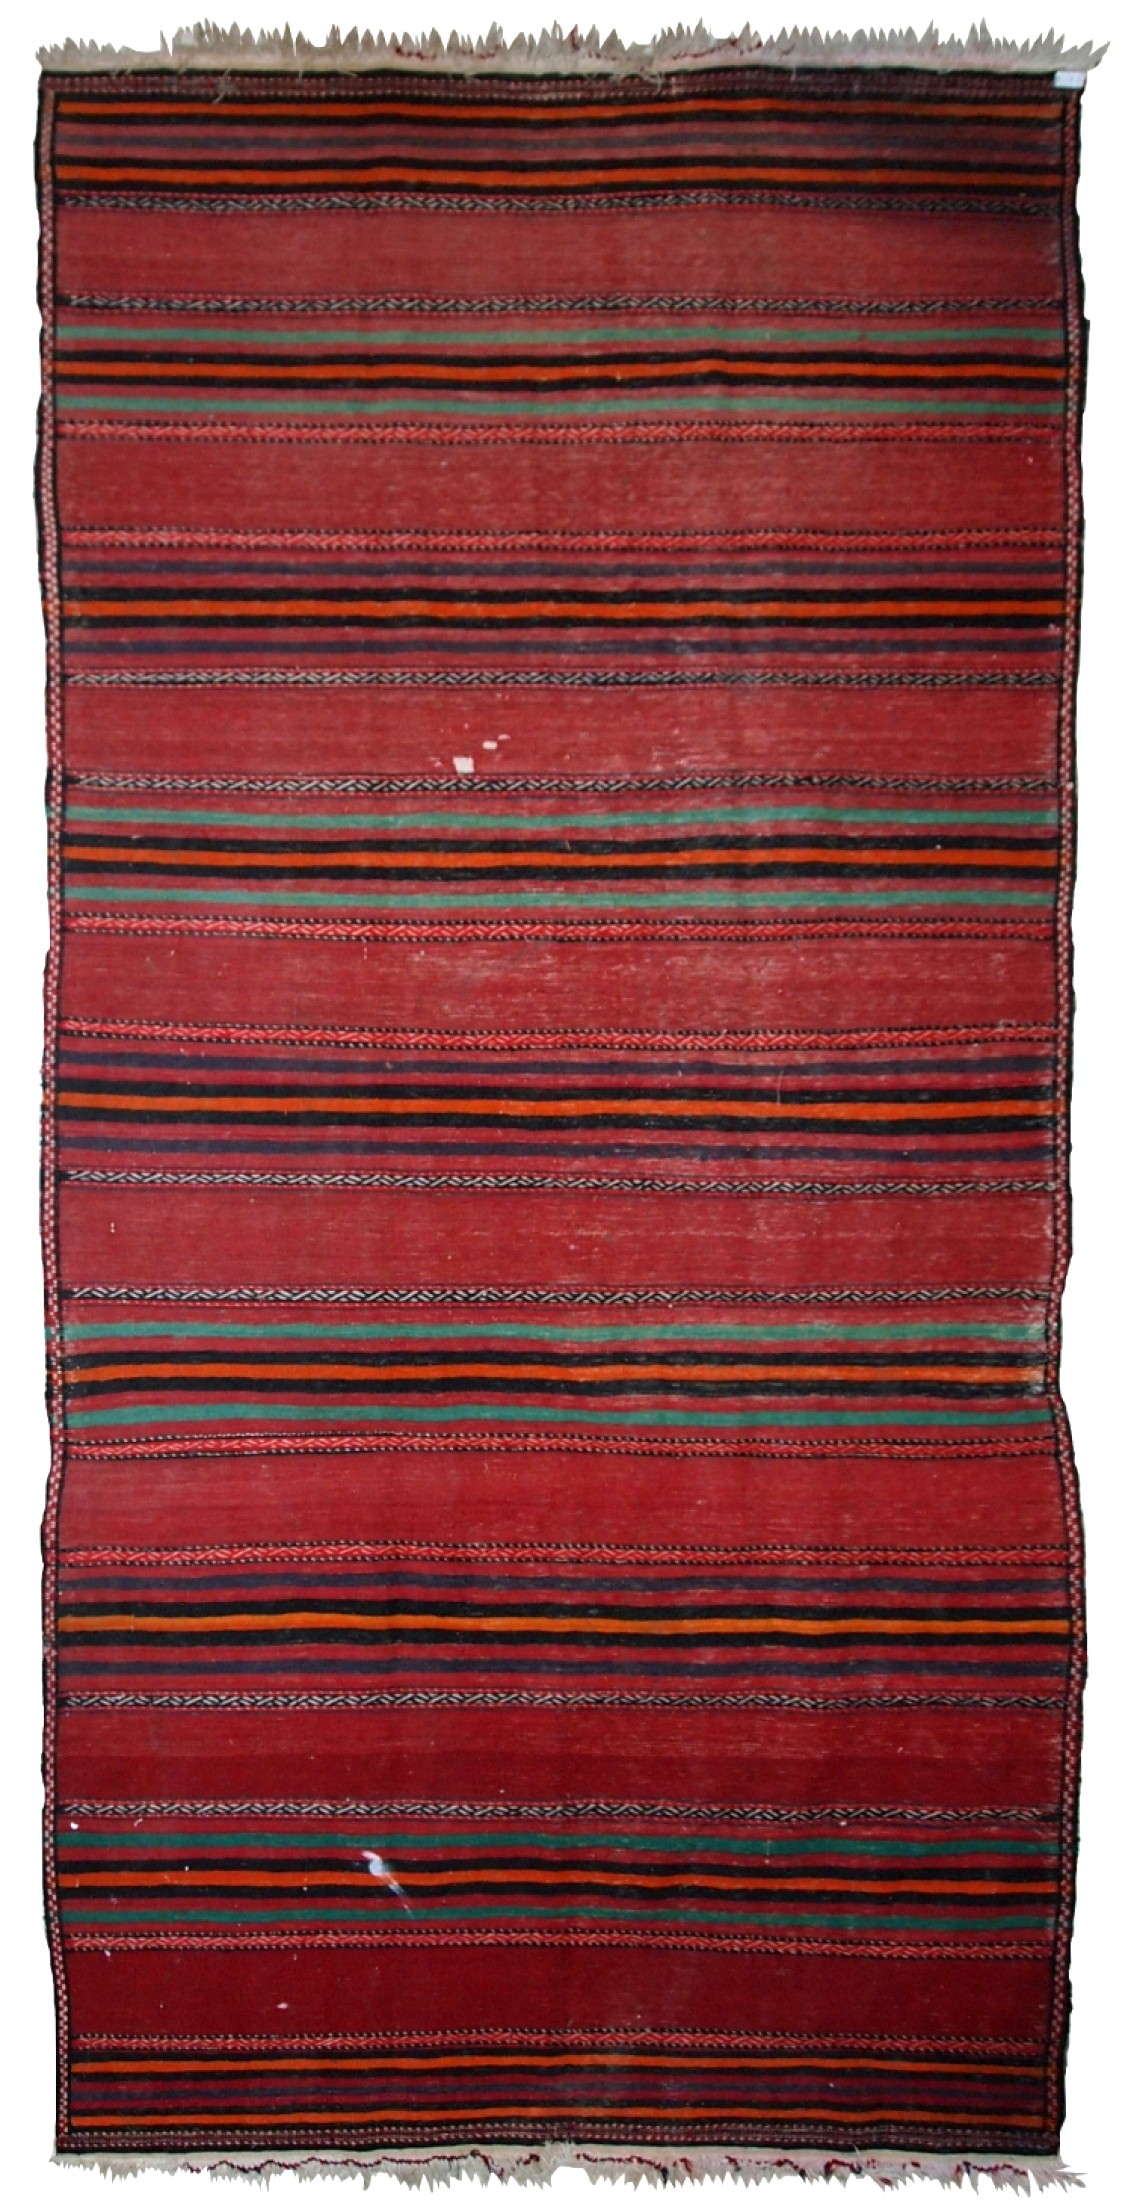 Handmade Vintage Persian Ardabil Striped Kilim Rug